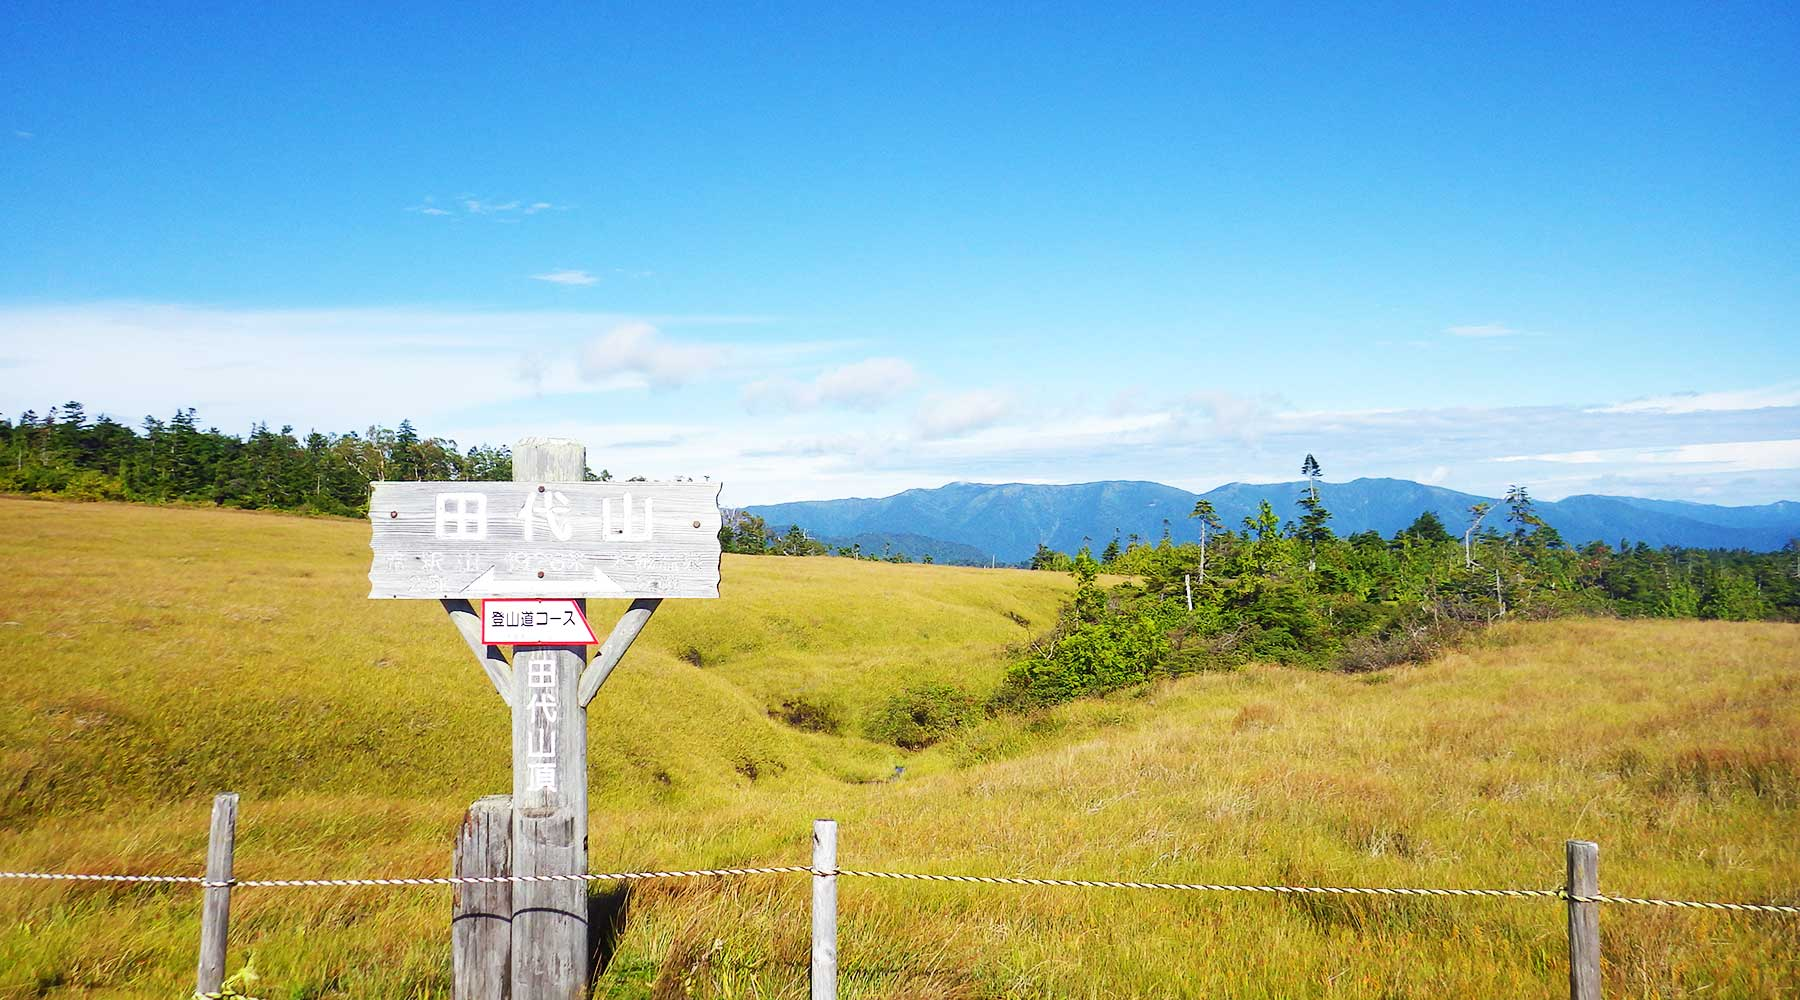 田代山山頂の標識